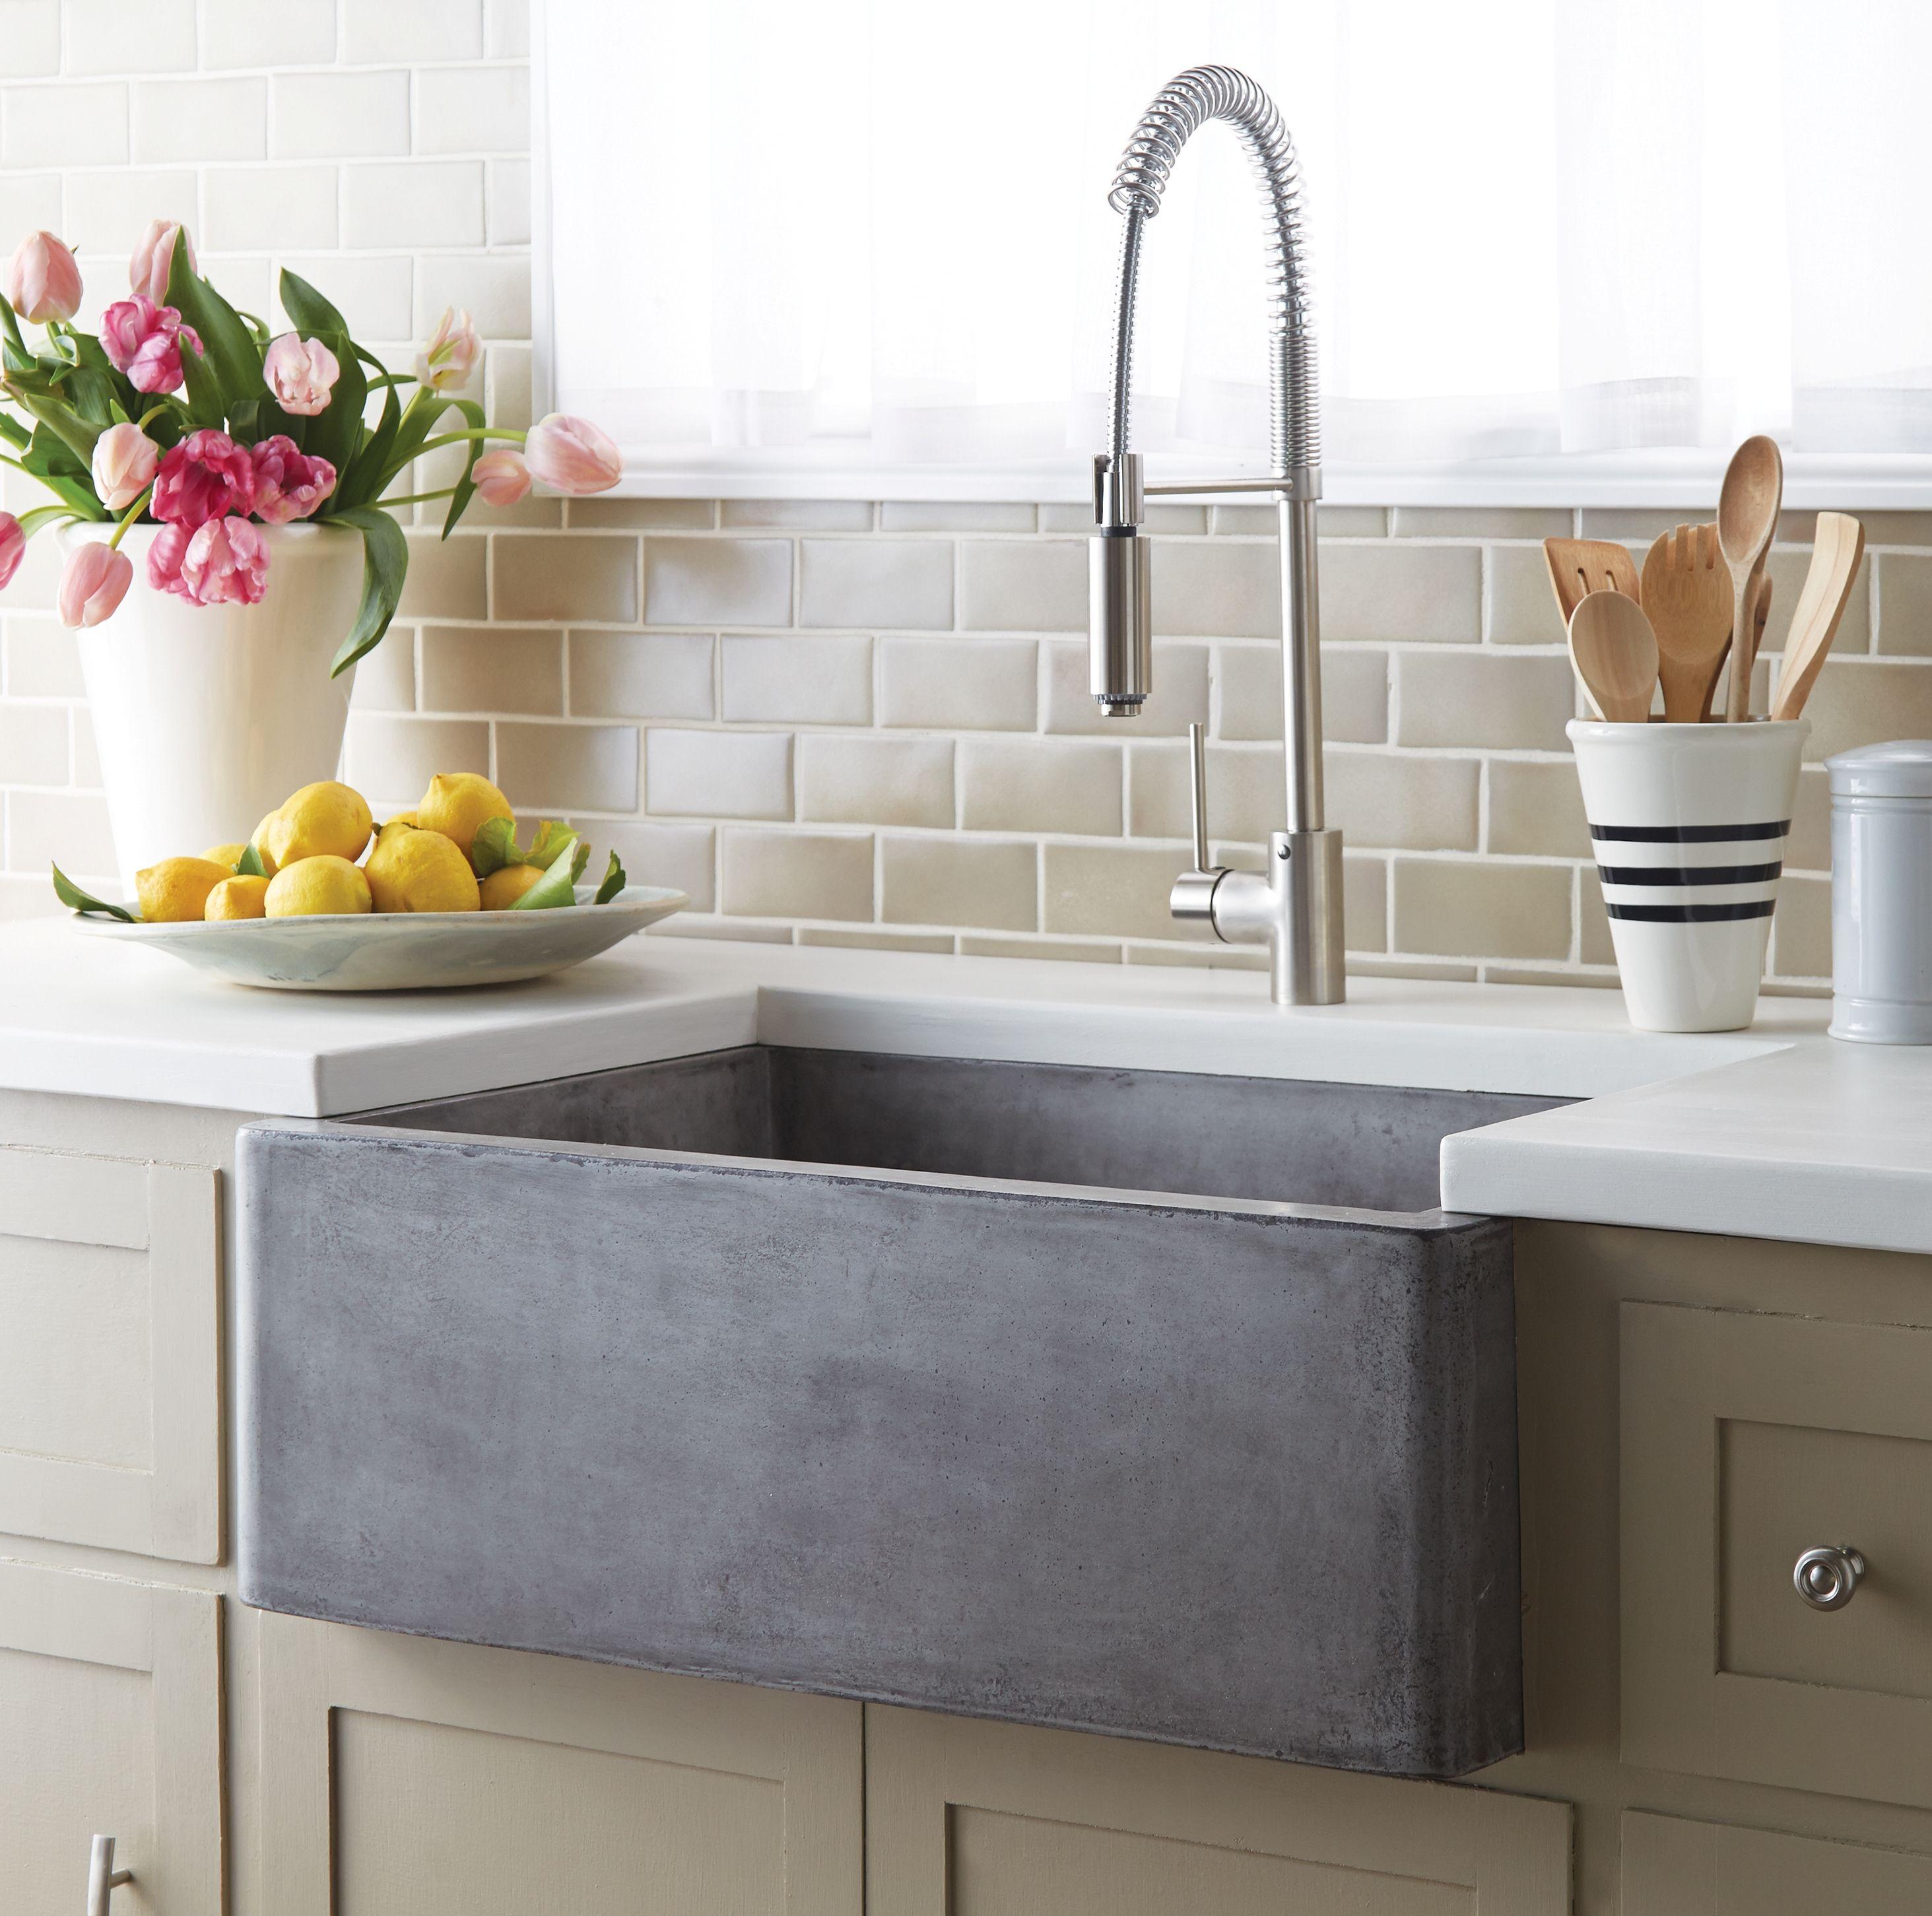 Wonderful Single Concrete Farmhouse Sink With High Arc Single